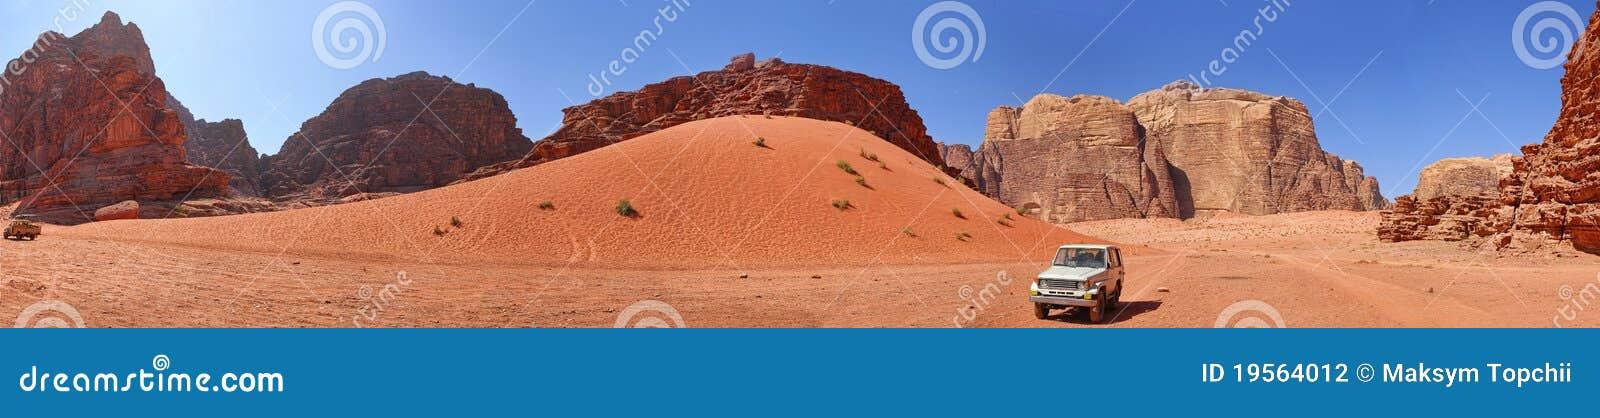 Vadi för jordan panoramaRAM